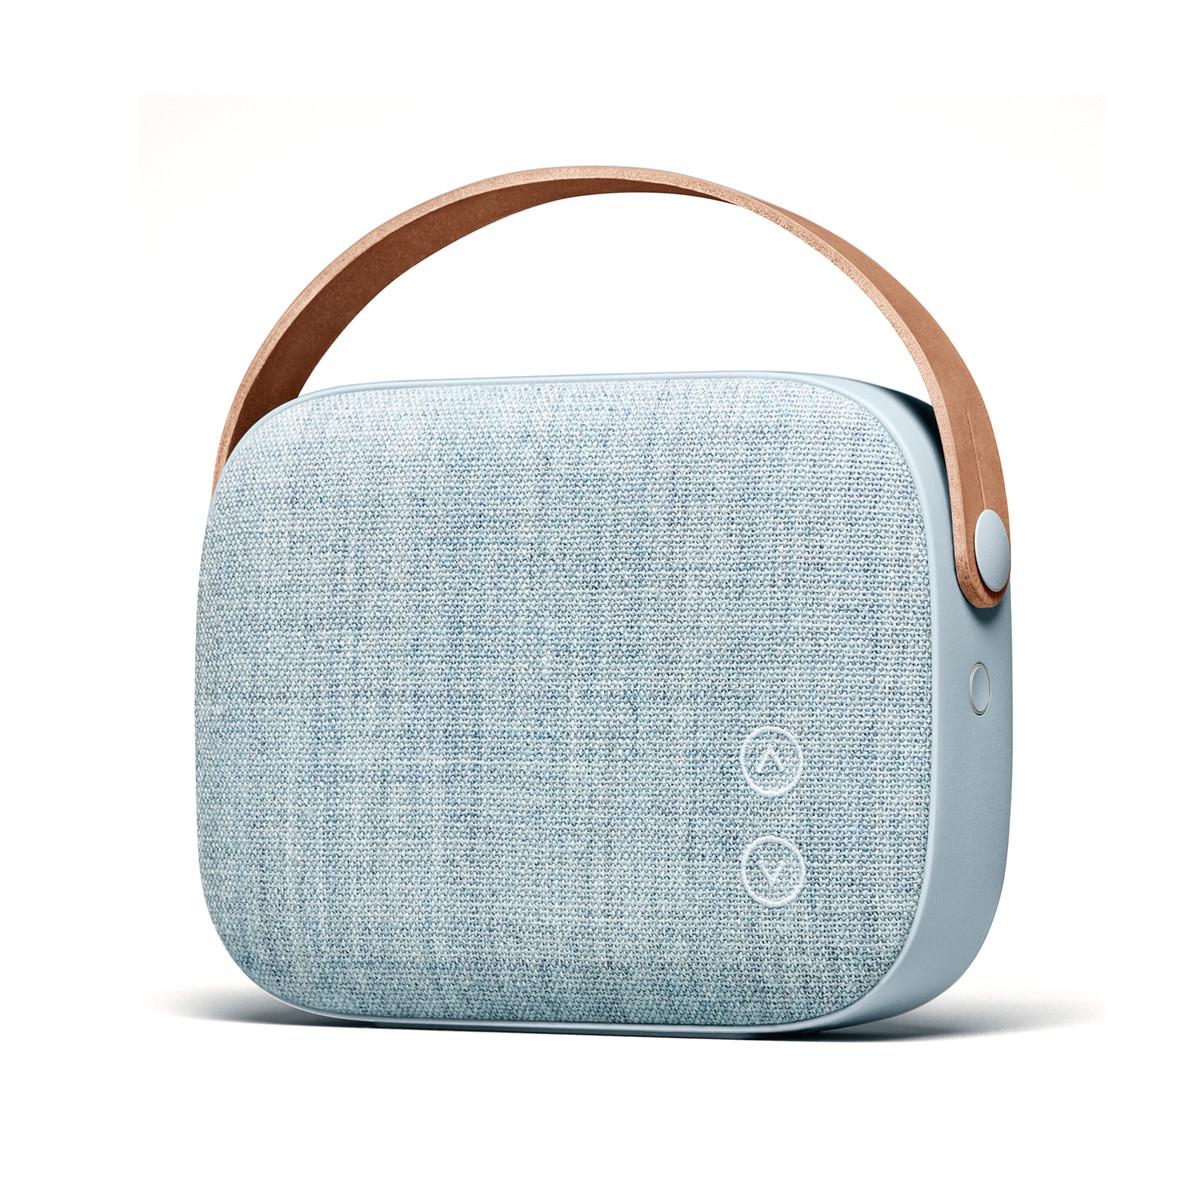 Vifa Helsinki - portabler Oberklasse Bluetotth Lautsprecher in blau oder rosa für 284,51 statt 371 €